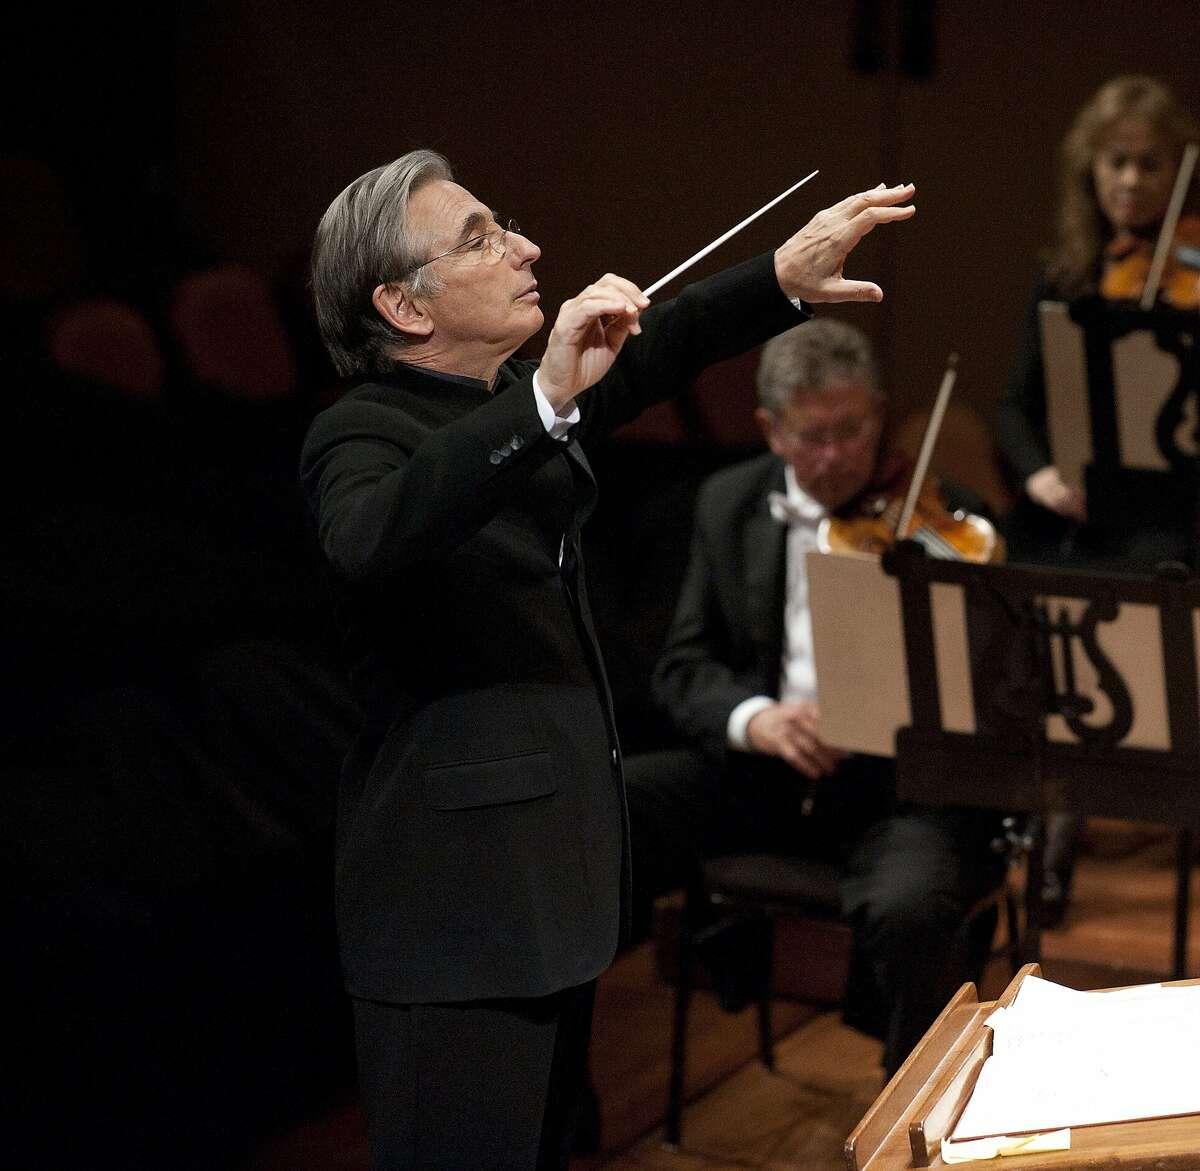 Michael Tilson Thomas San Francisco Symphony dress rehearsal at Davies Symphony Hall on Wednesday September 21, 2011.